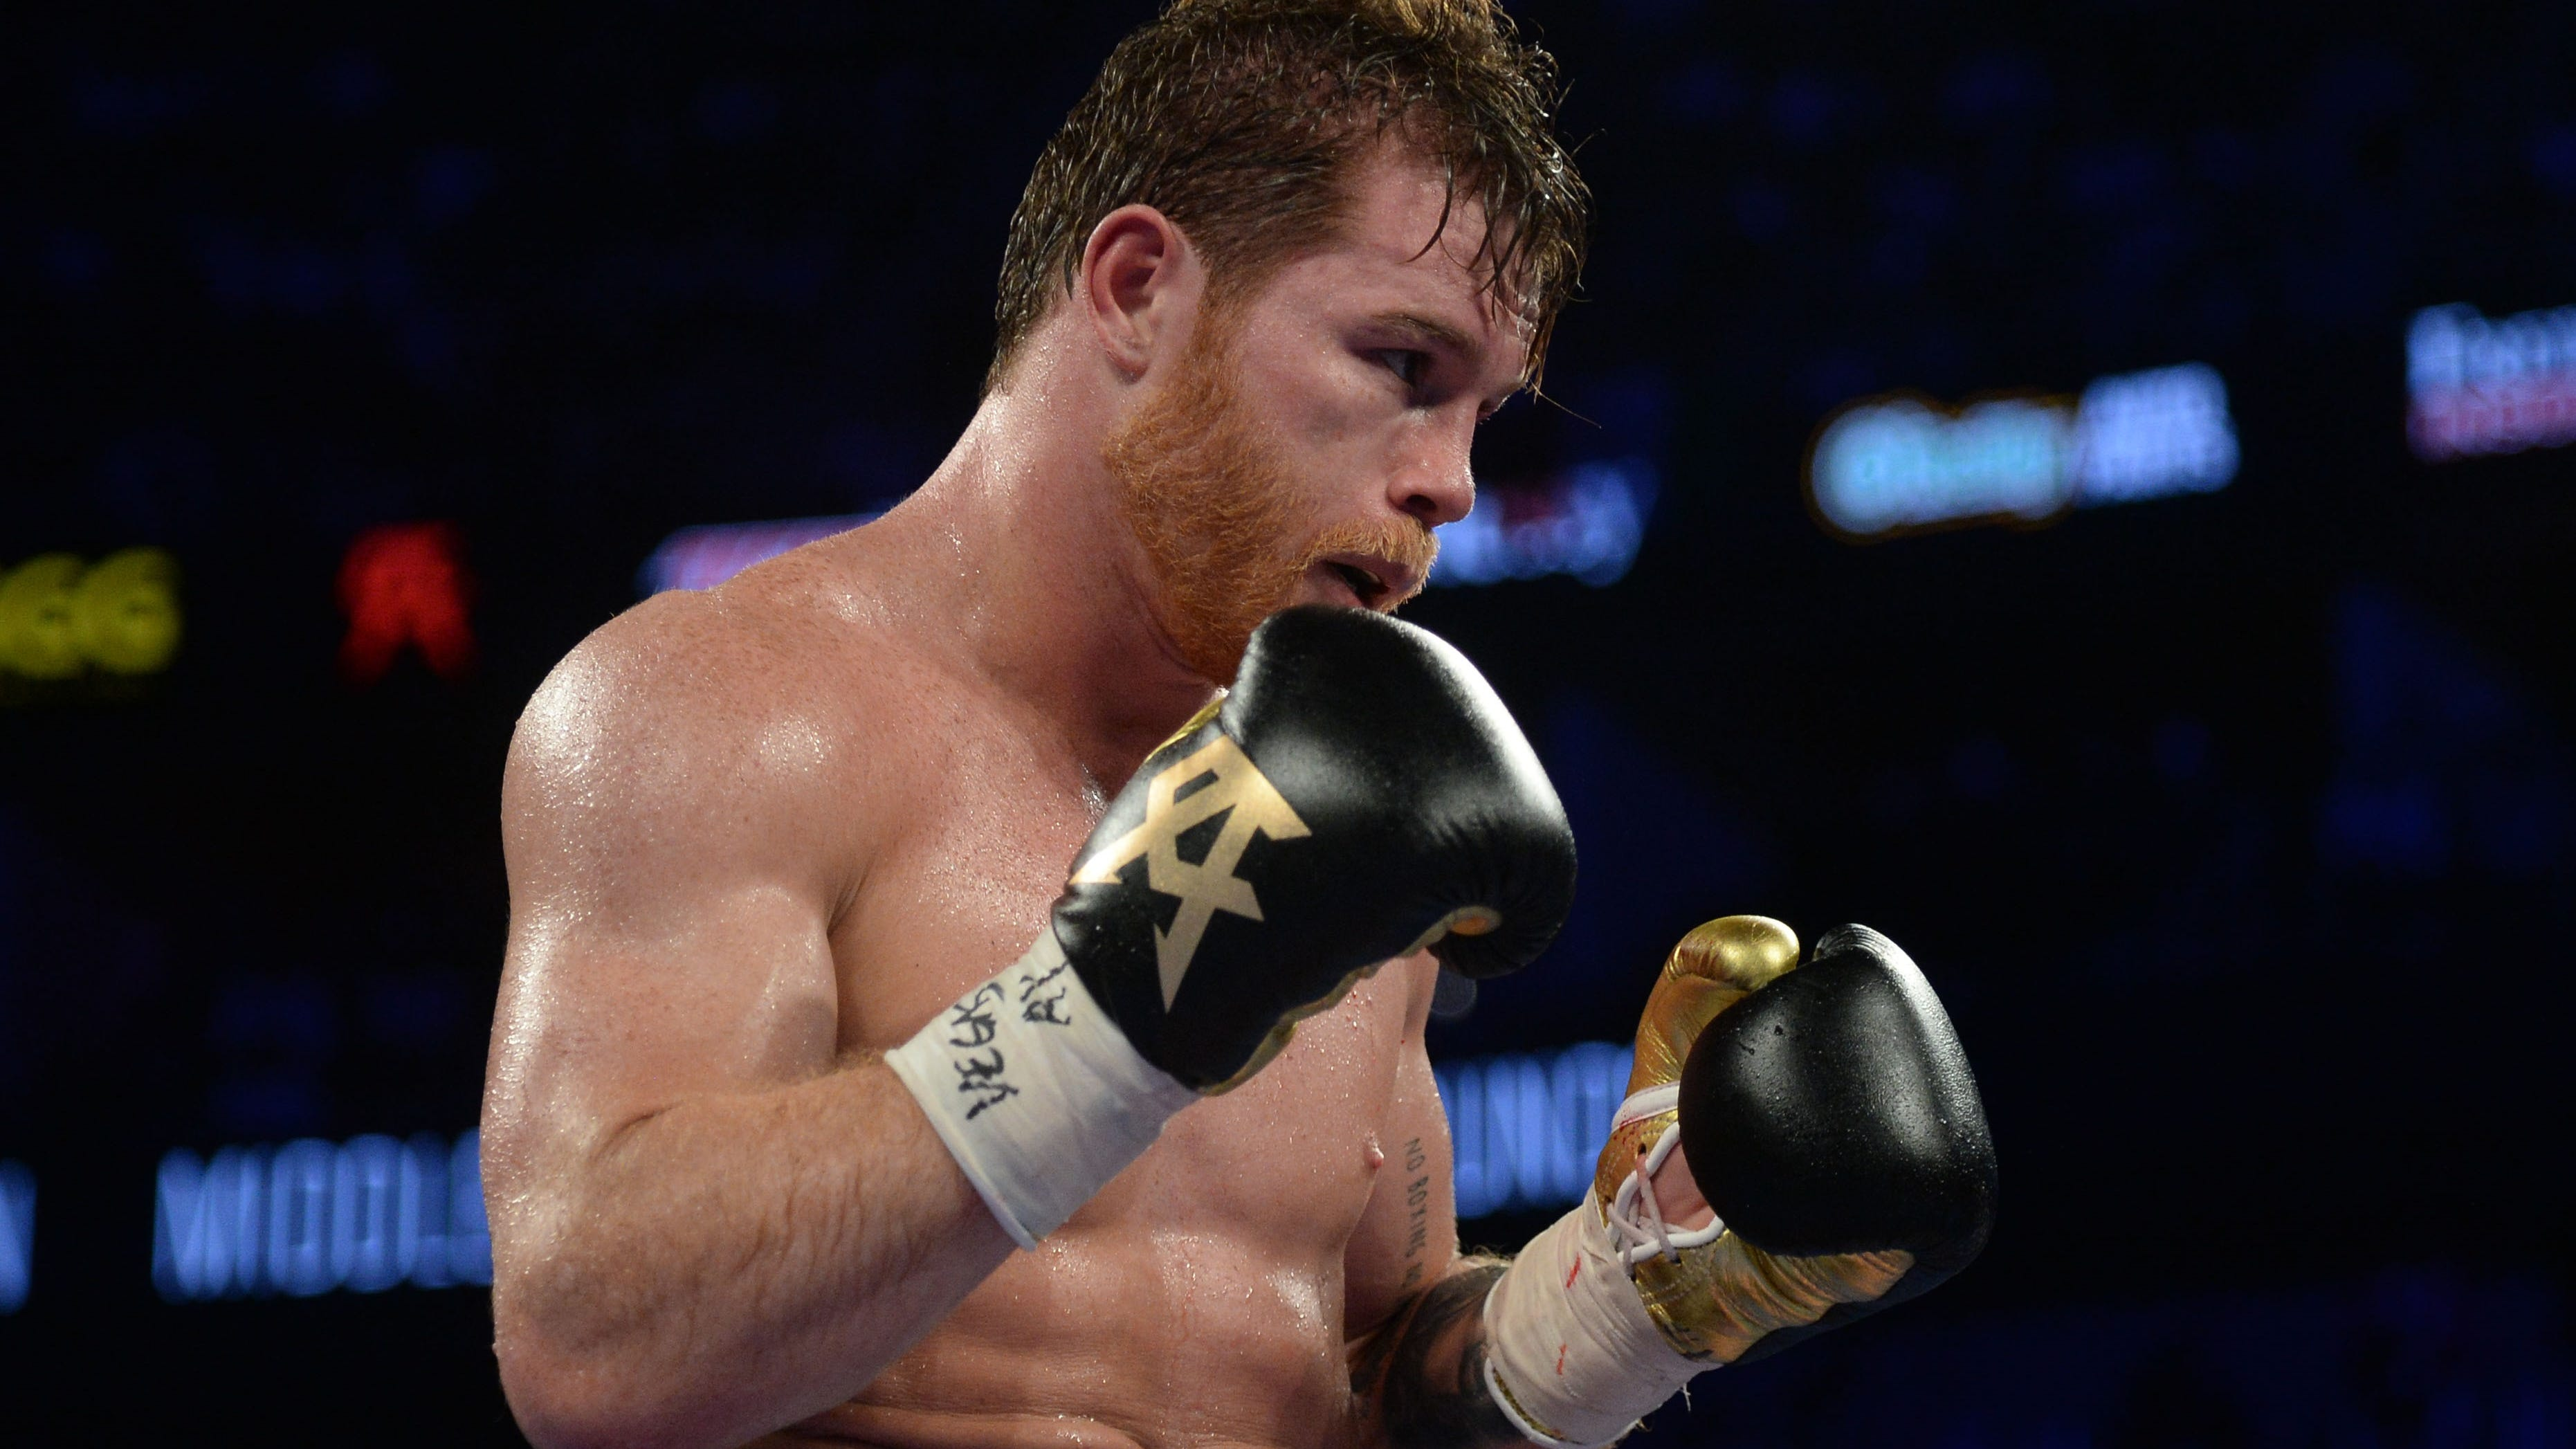 Canelo Alvarez's non-controversial steal over Gennady Golovkin a bigger victory for boxing thumbnail